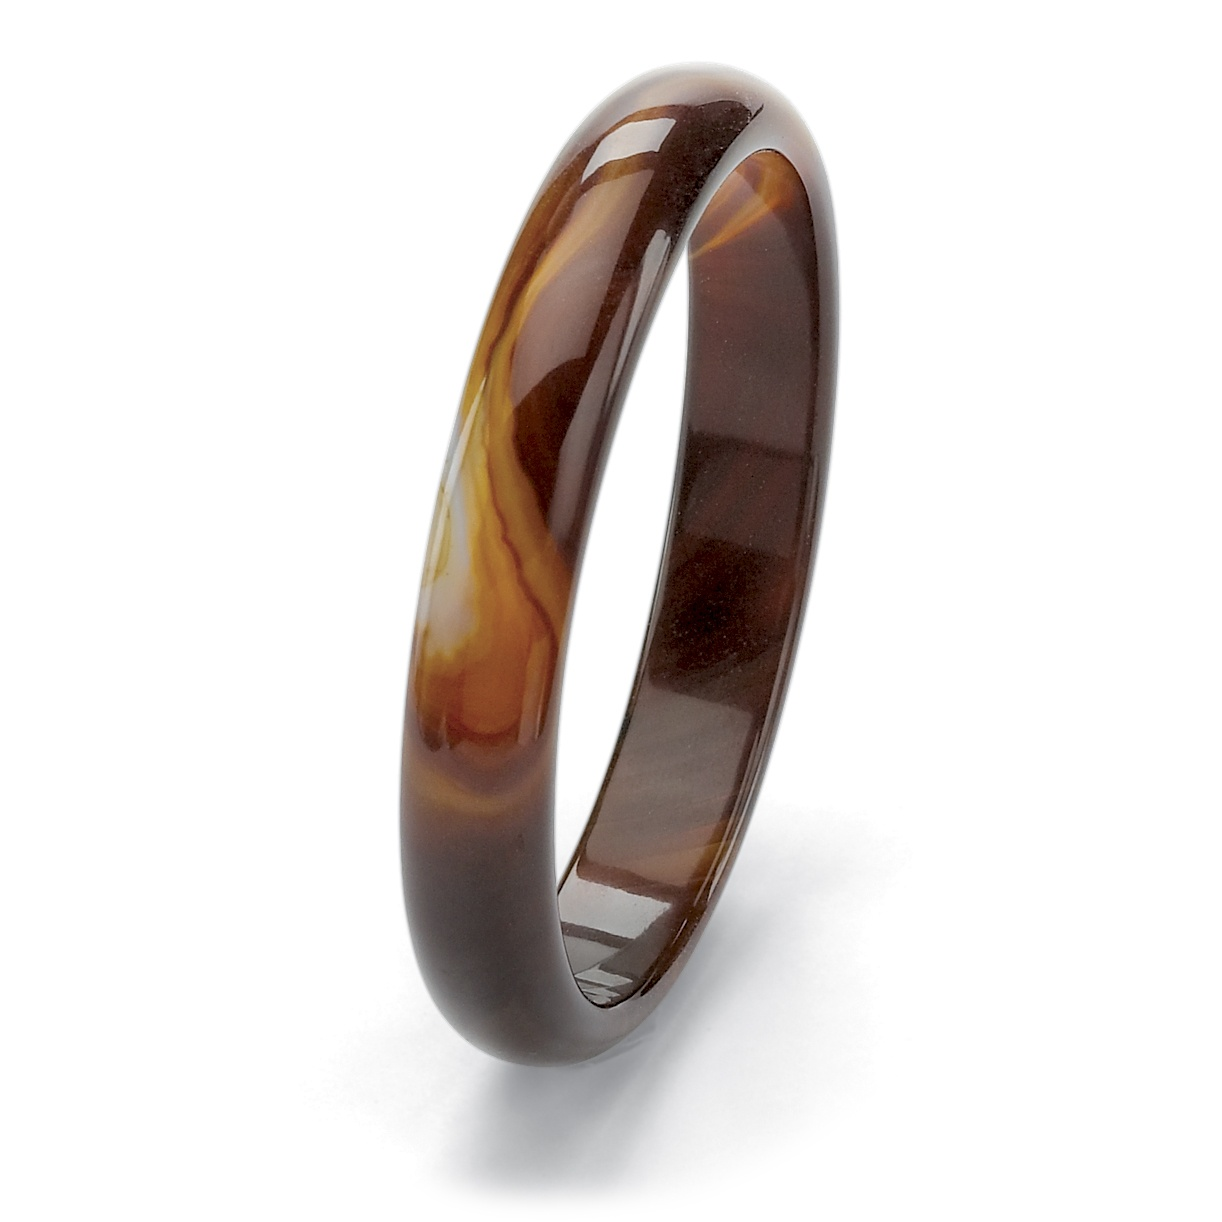 "Genuine Brown Agate Bangle Bracelet 9"" (13mm) by PalmBeach Jewelry"